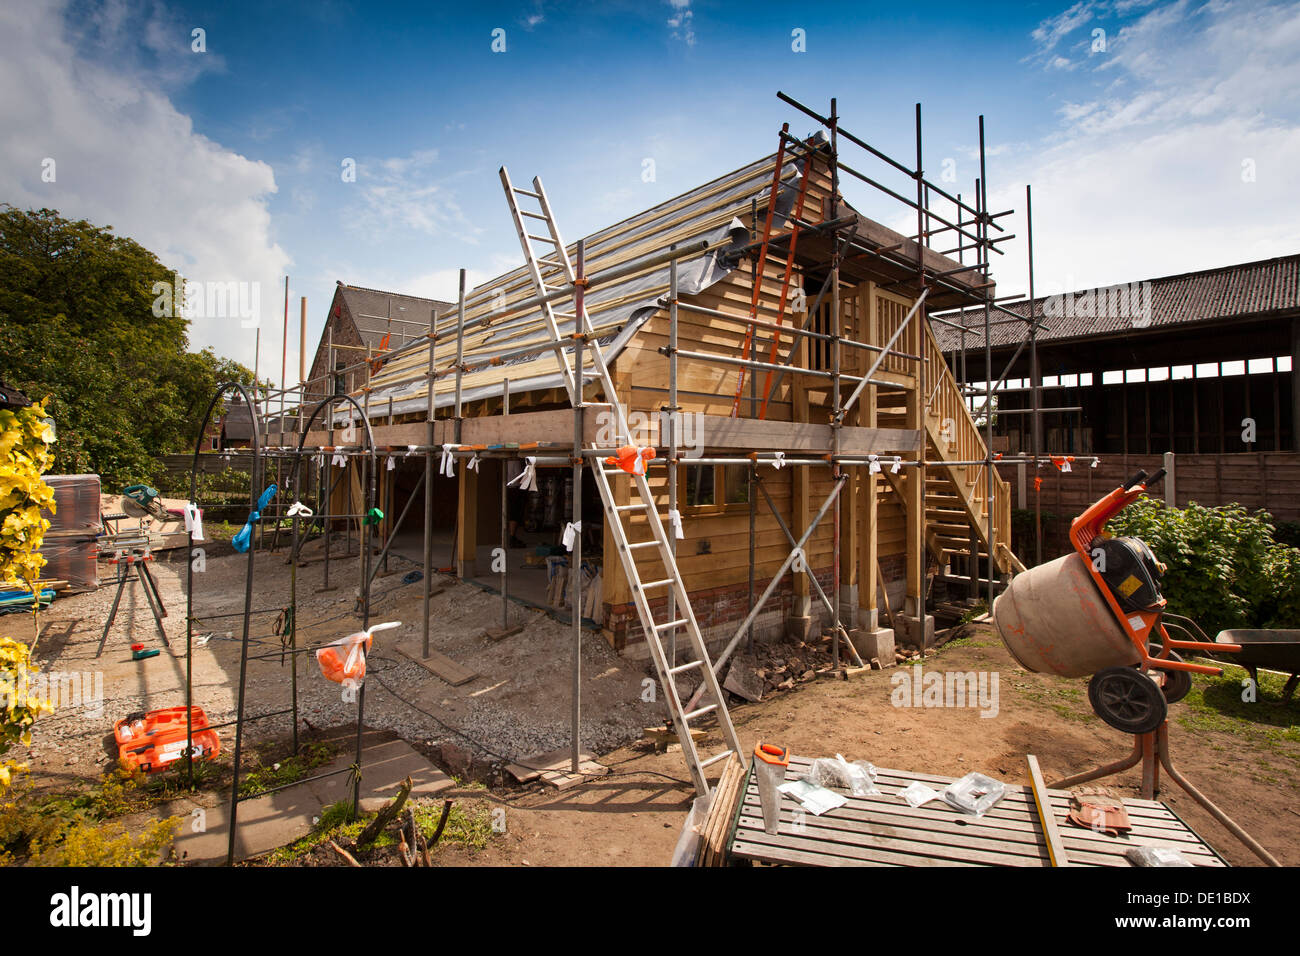 Selbst Hausbau Gerahmt Bau Grune Eiche Holz Garage Externe Gerust